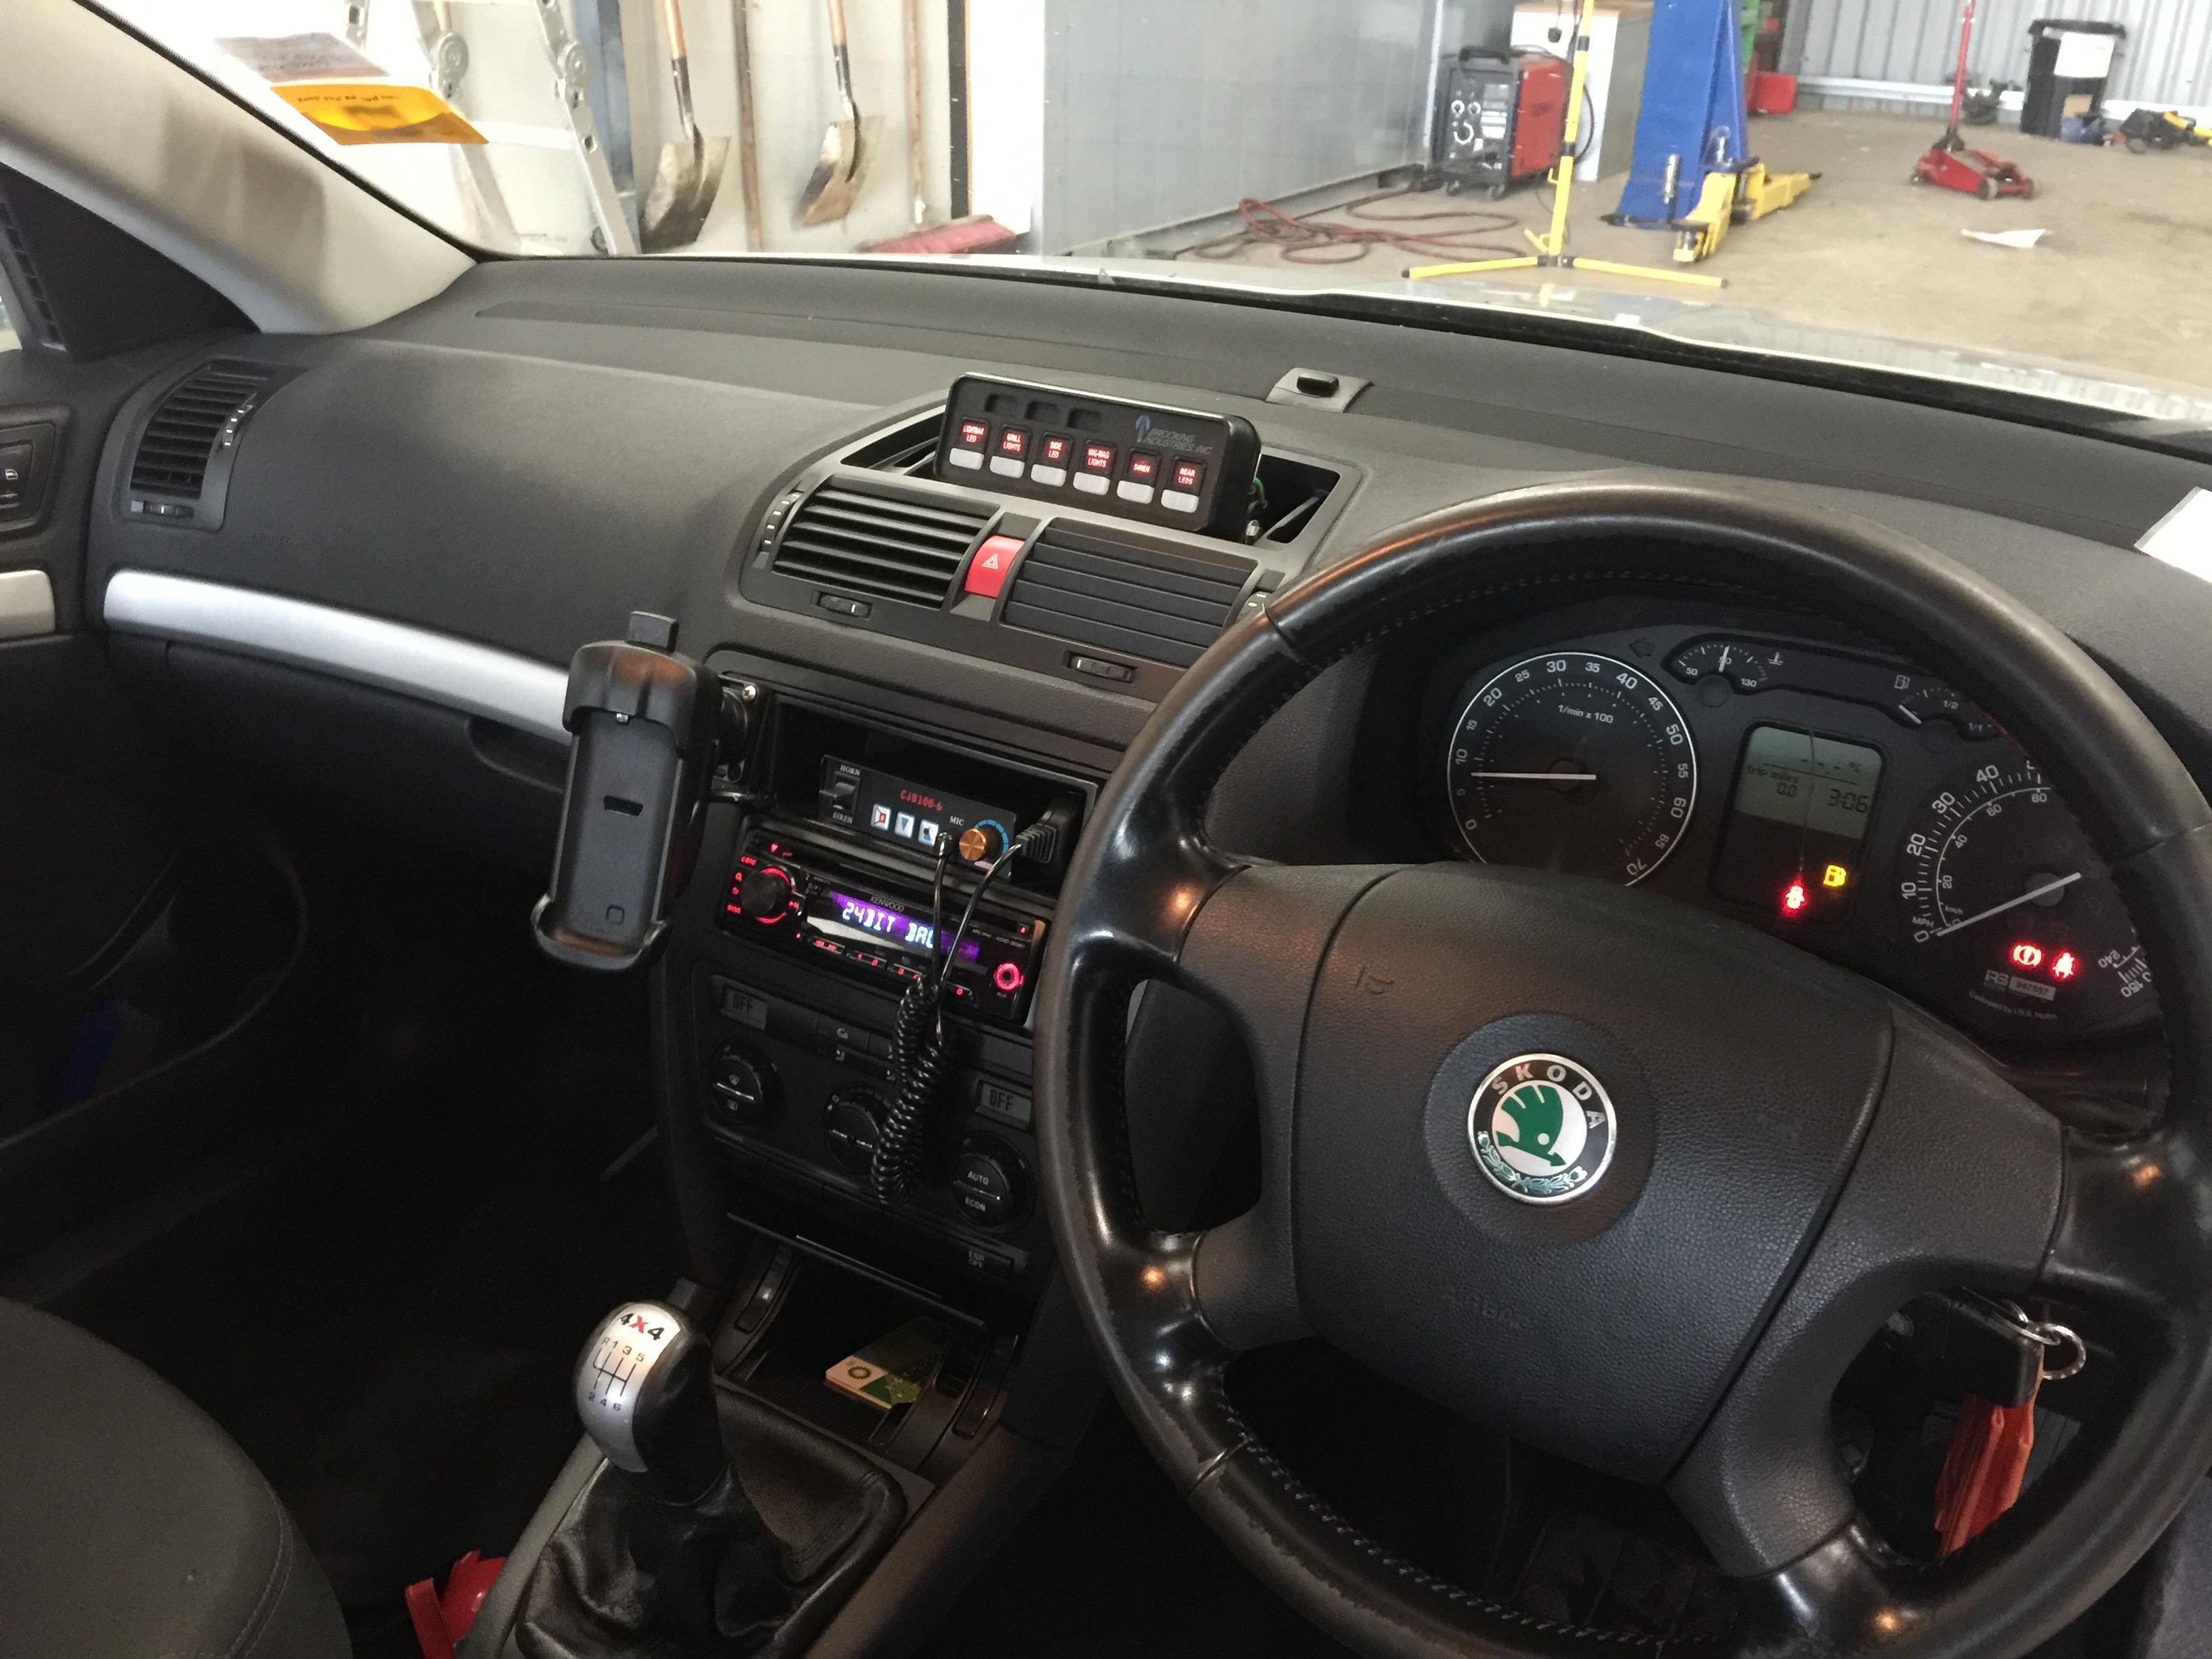 Lot 12 - Skoda Octavia 2.0Fsi all wheel drive petrol estate rapid response vehicle, registration No GN07 FPP,